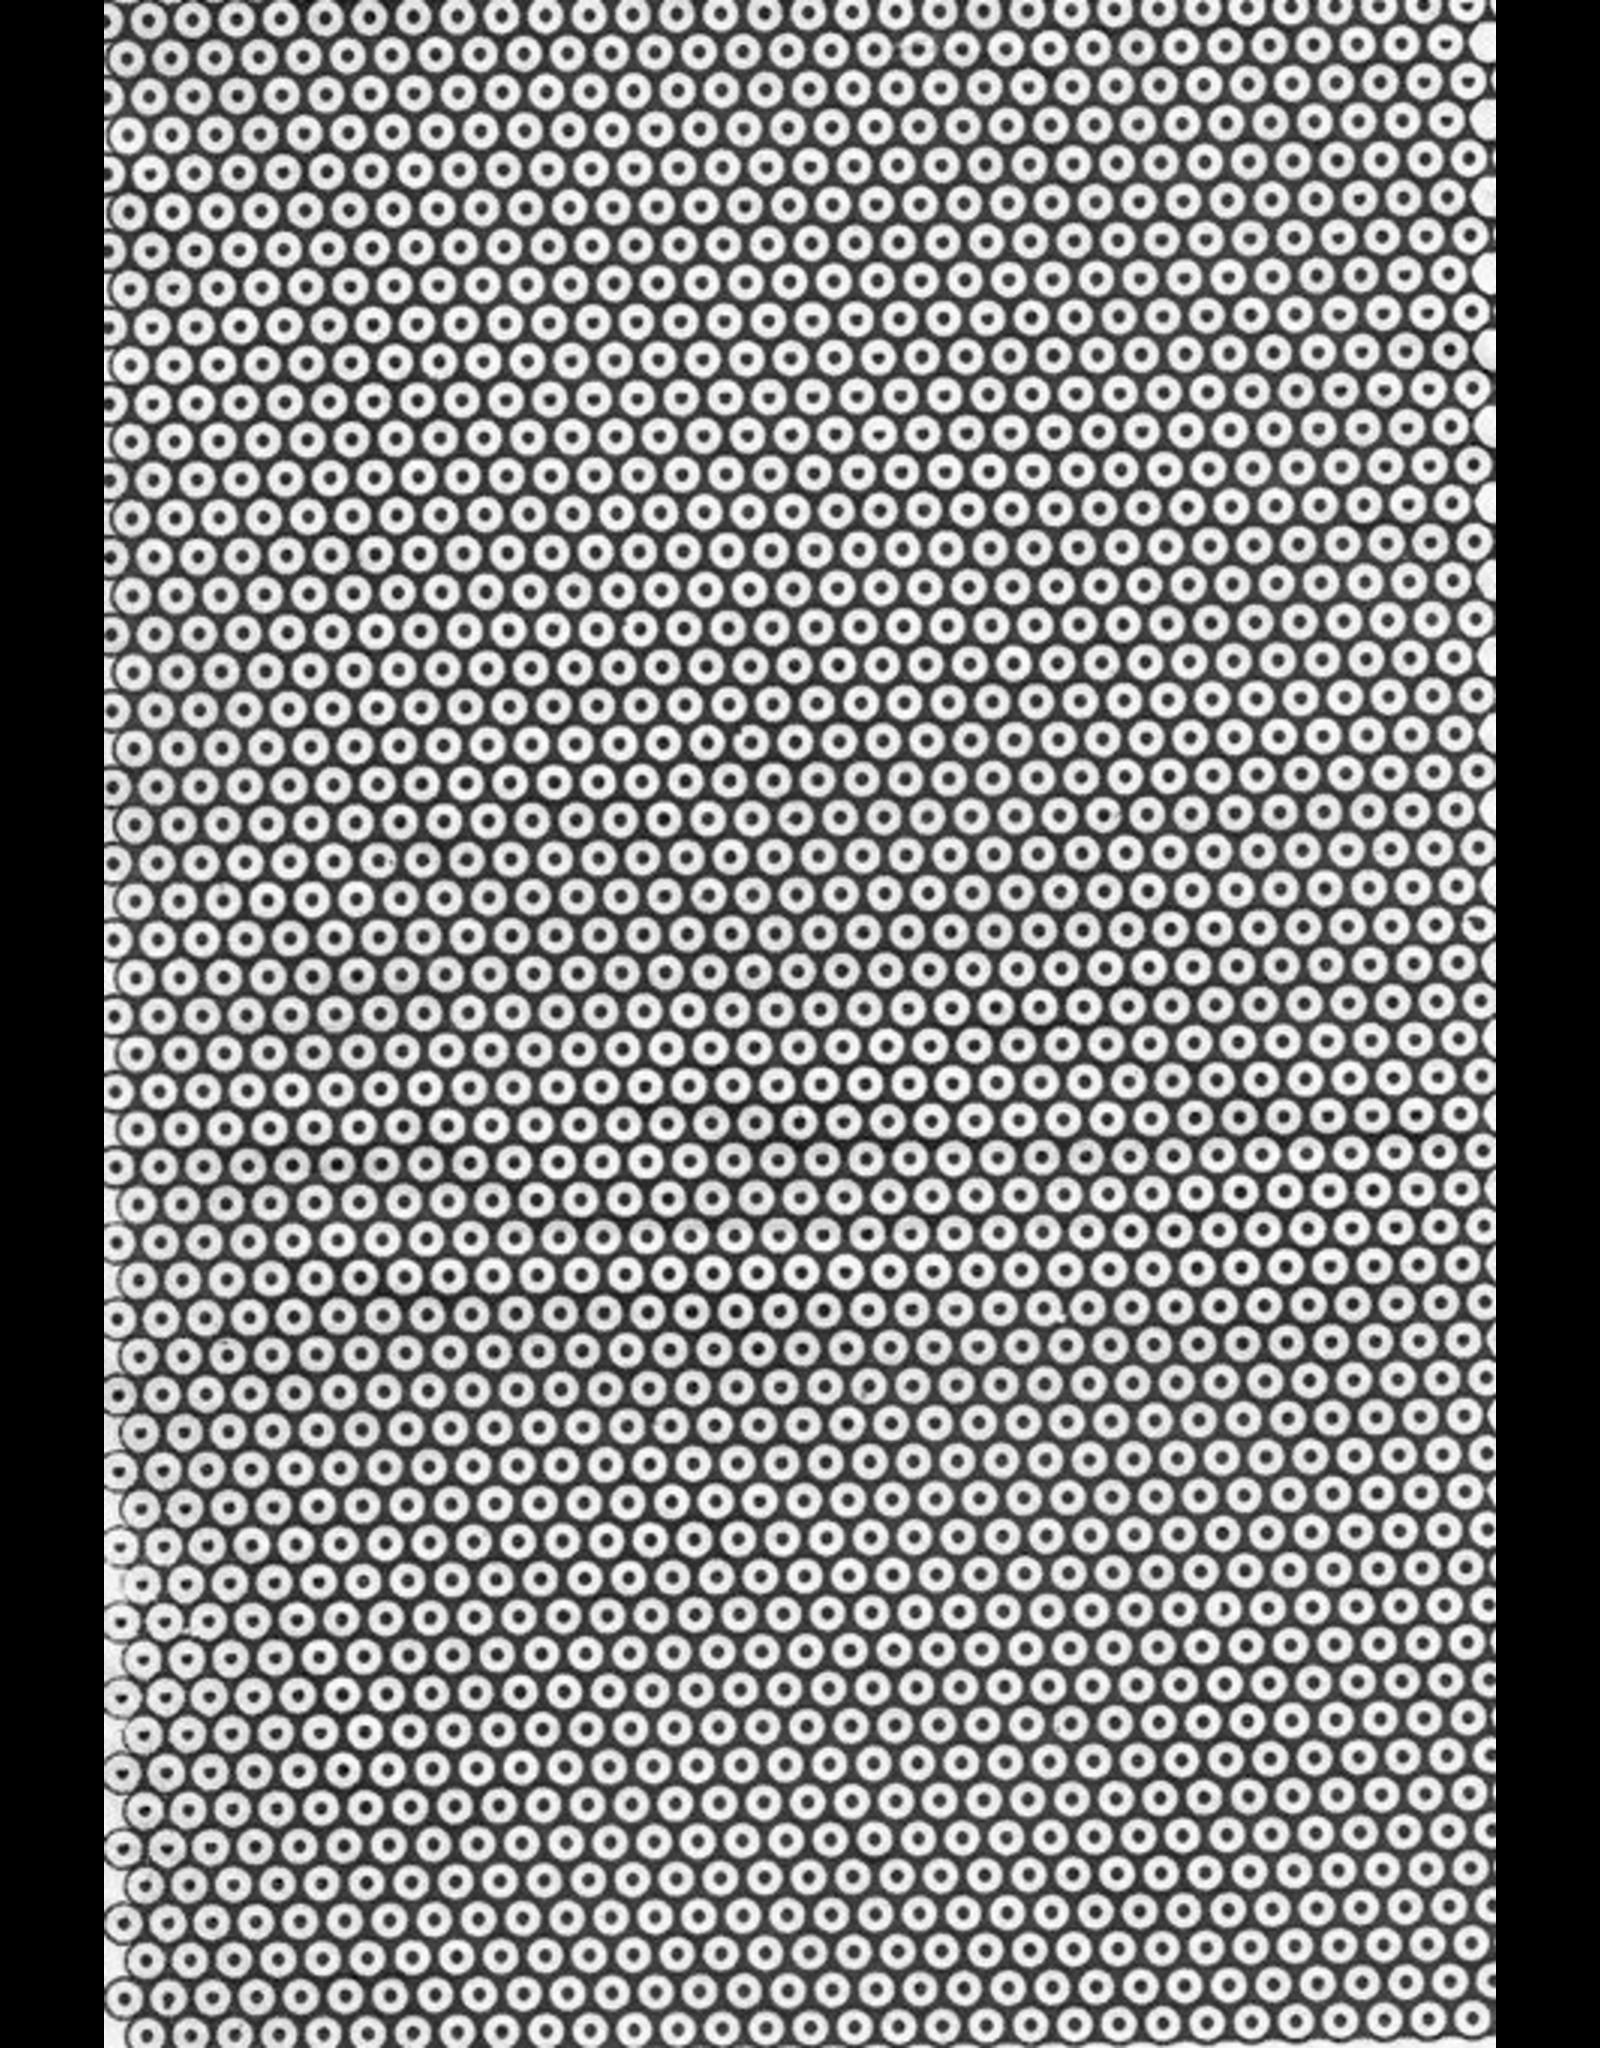 Sanbao Pattern decal 1